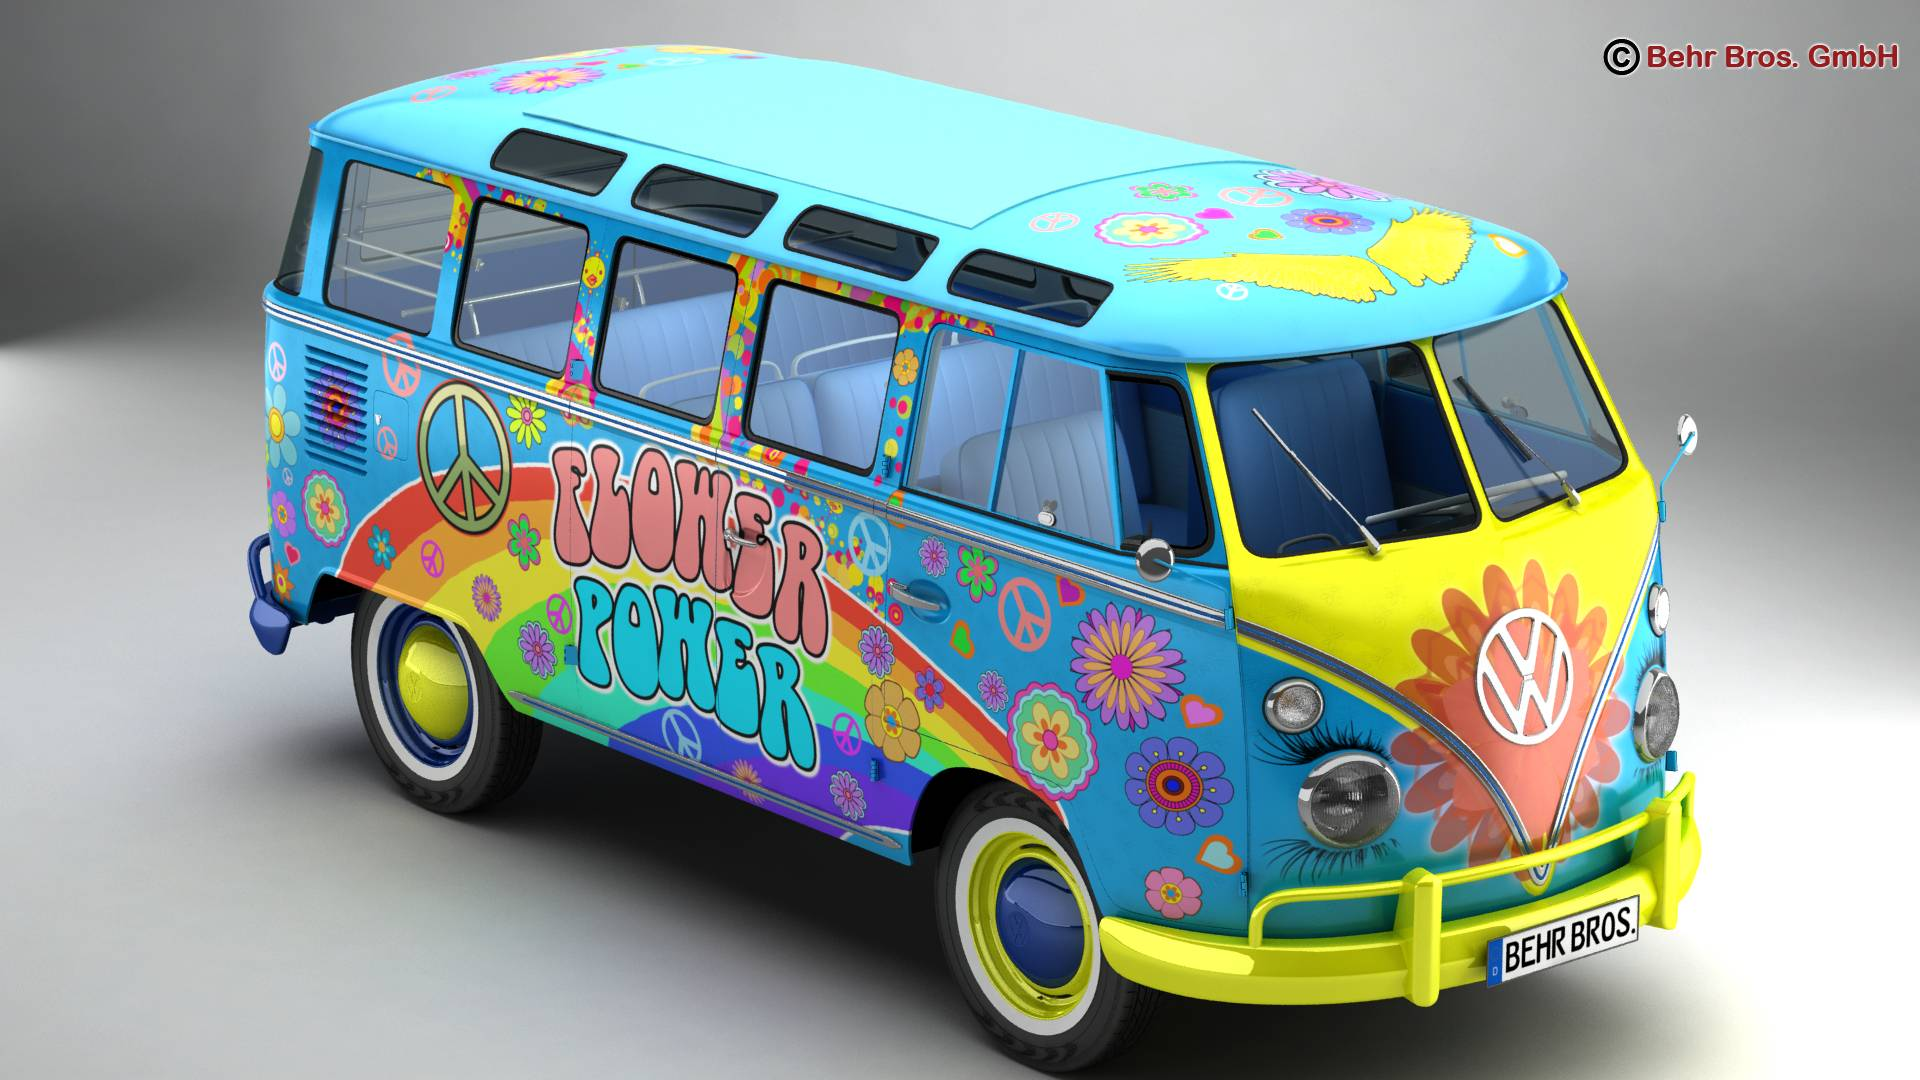 volkswagen type 2 samba 1963 hippie 3d model 3ds max fbx c4d lwo ma mb obj 217241